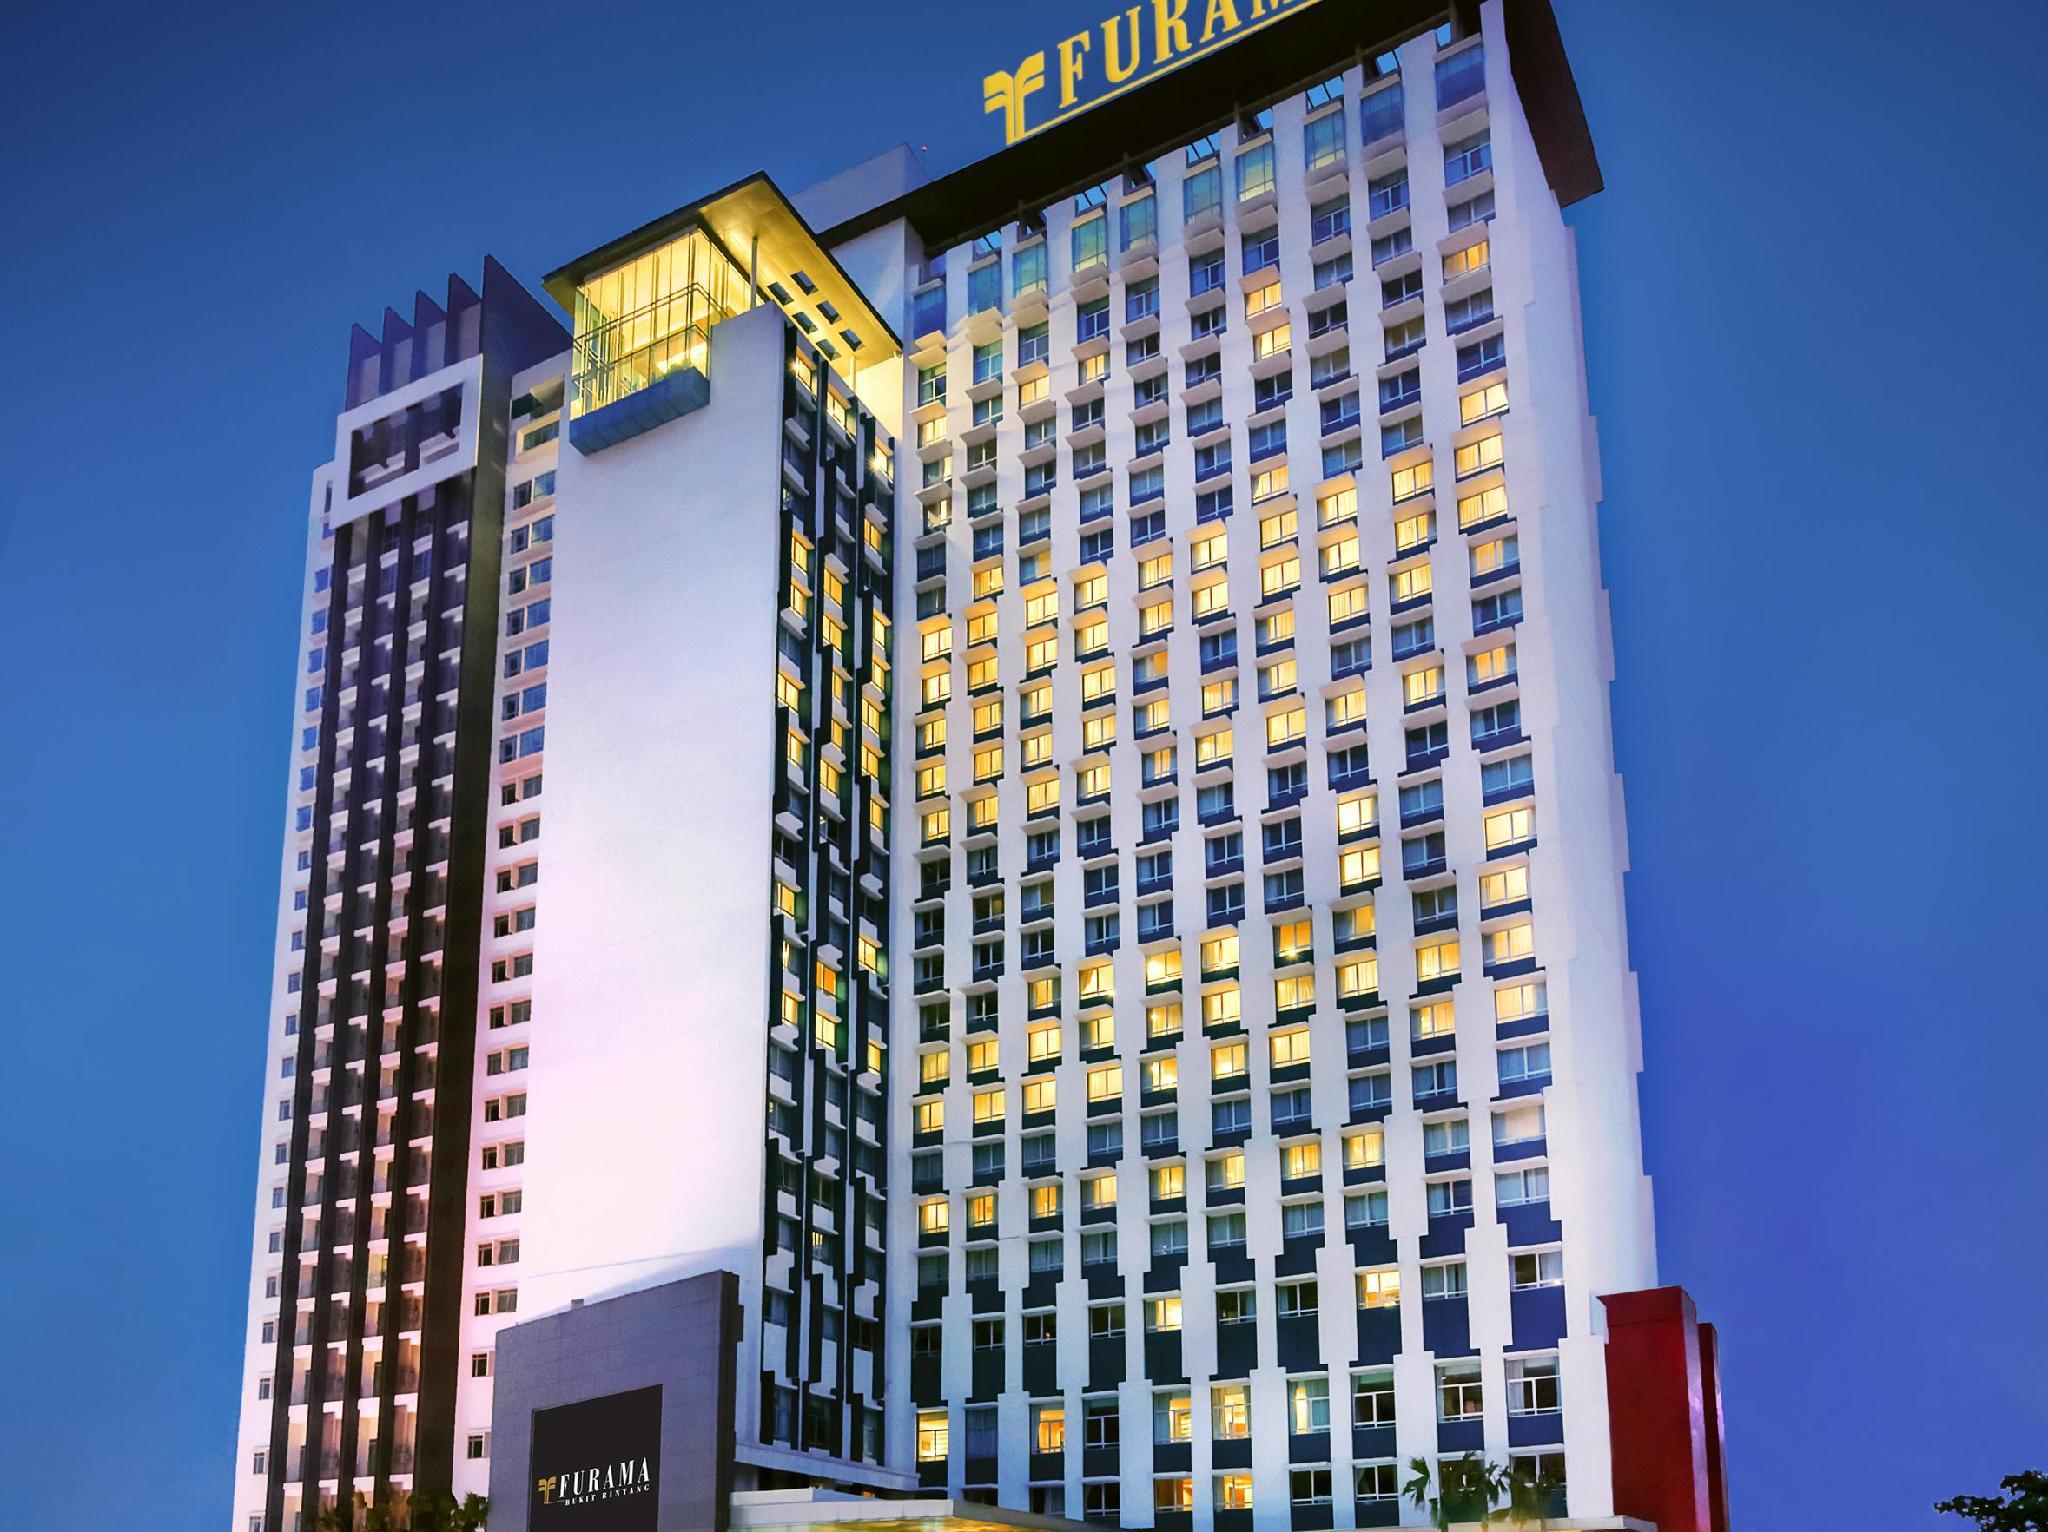 Furama Hotel Bukit Bintang - Hotels and Accommodation in Malaysia, Asia